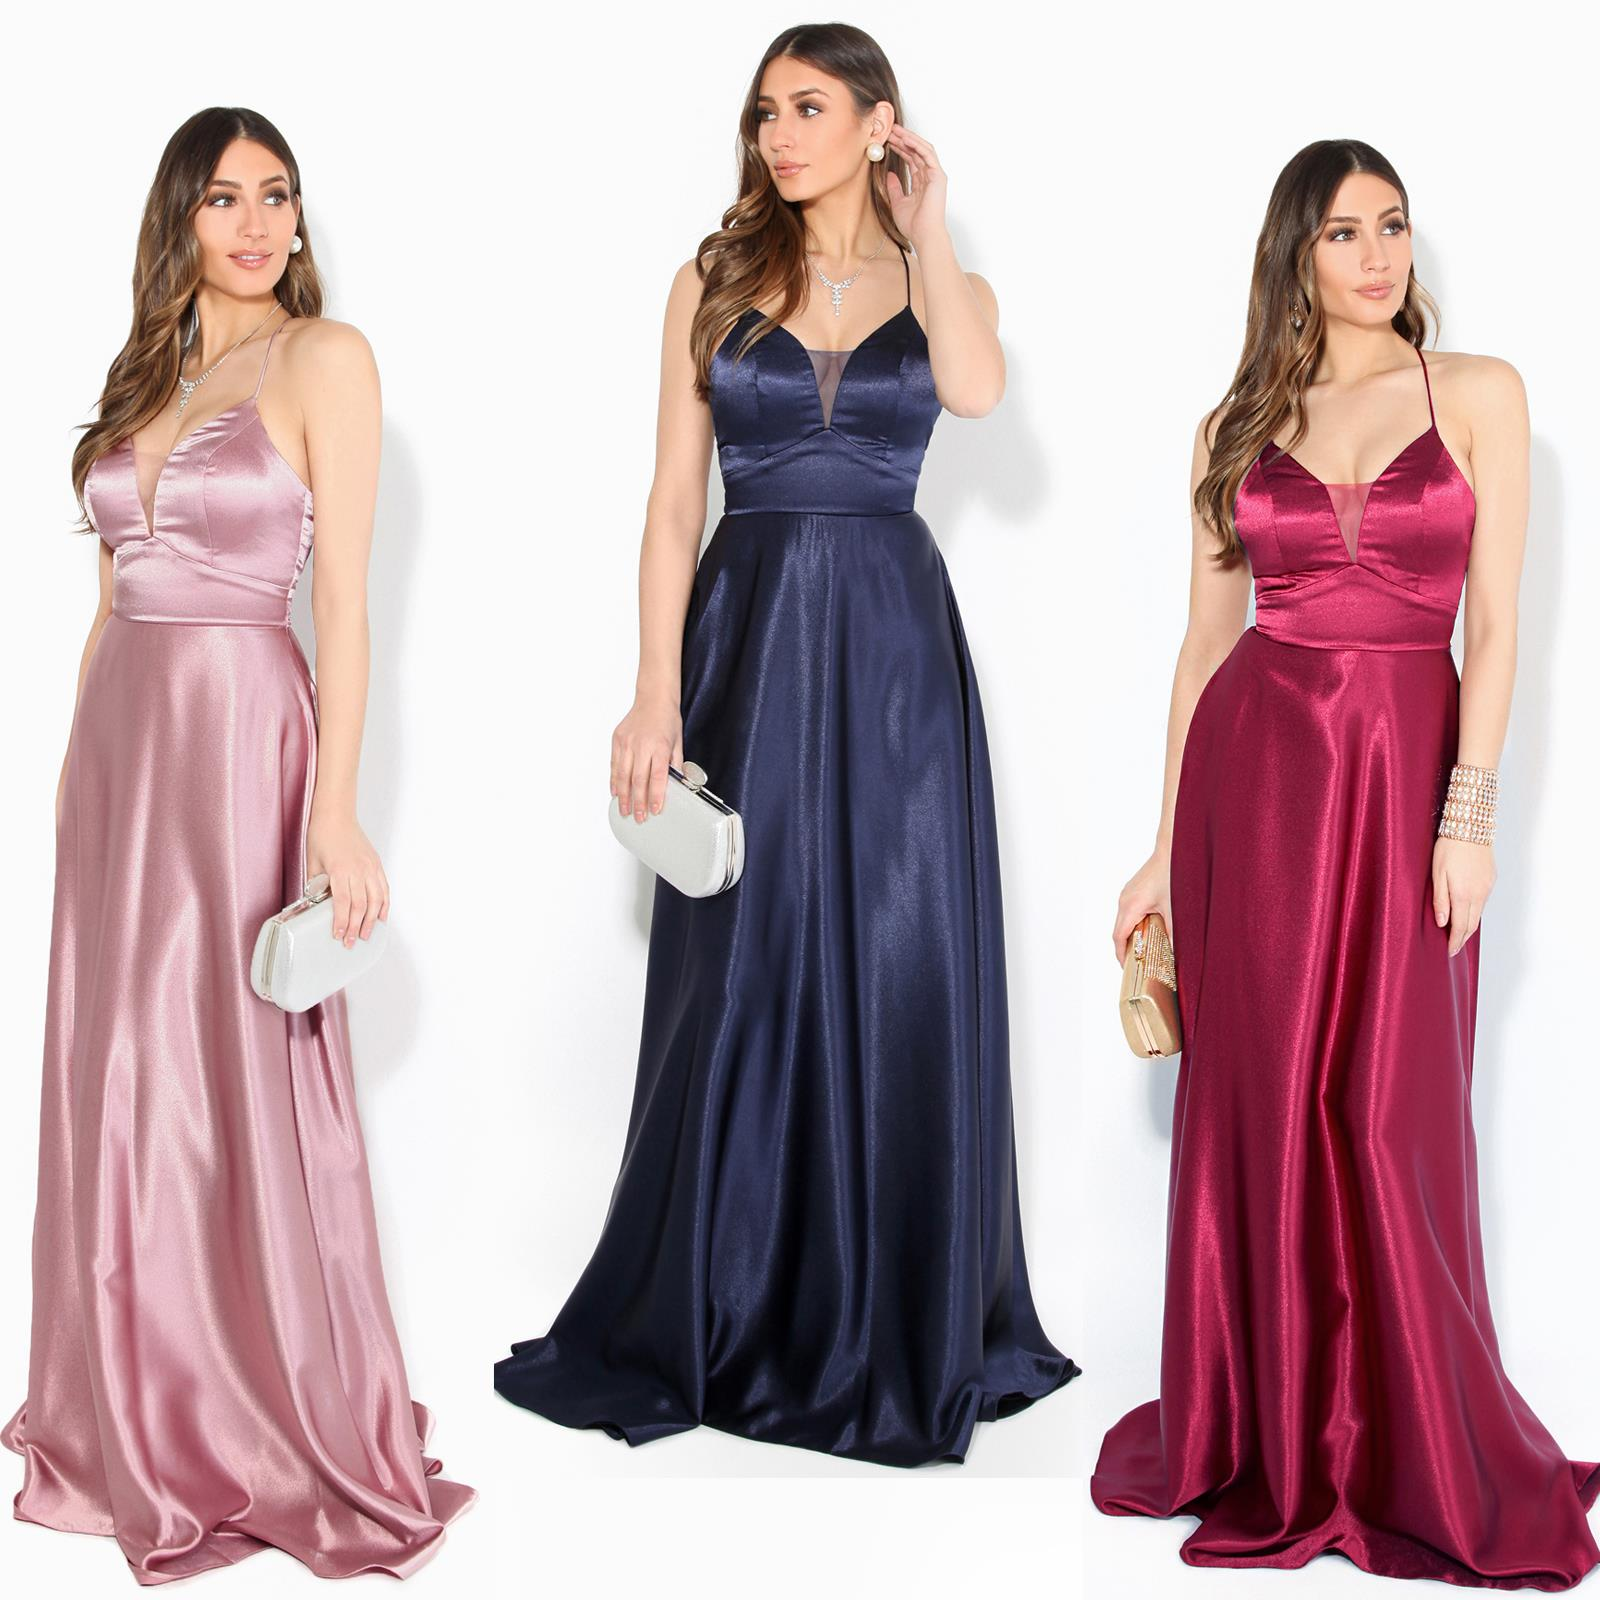 Women Ladies Strappy Maxi Dress Satin Evening Gown Wedding Cocktail Party Plus Ebay,Wedding Dress Shops In Miami